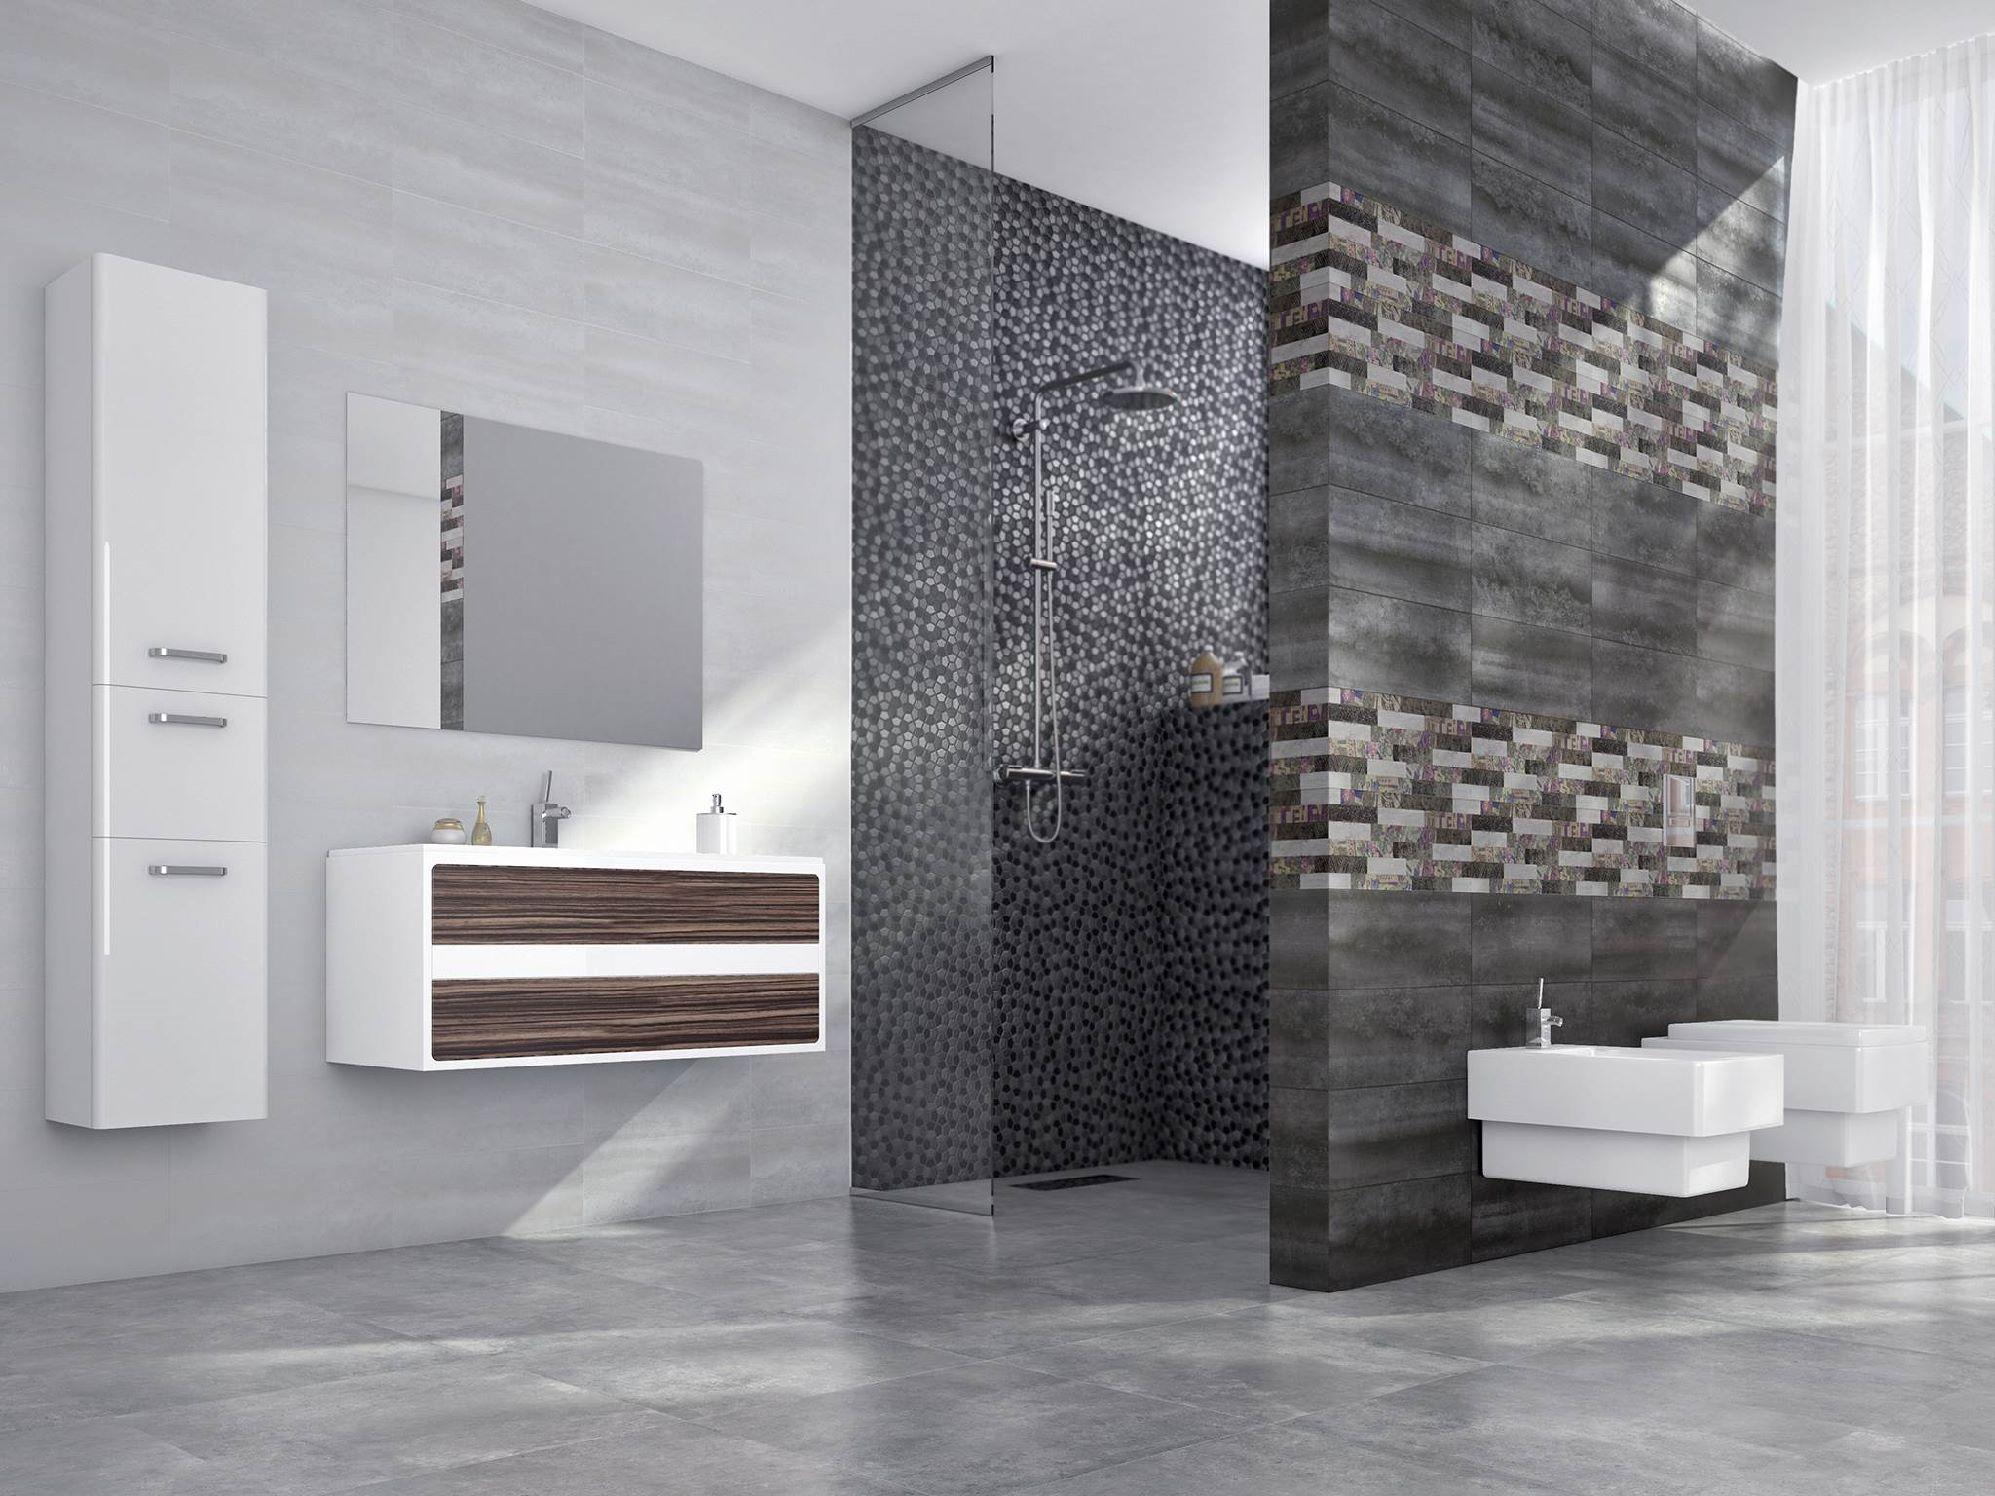 Faience salle de bain cifre serie oxigeno 20x50 1 choix - Faience salle de bain discount ...